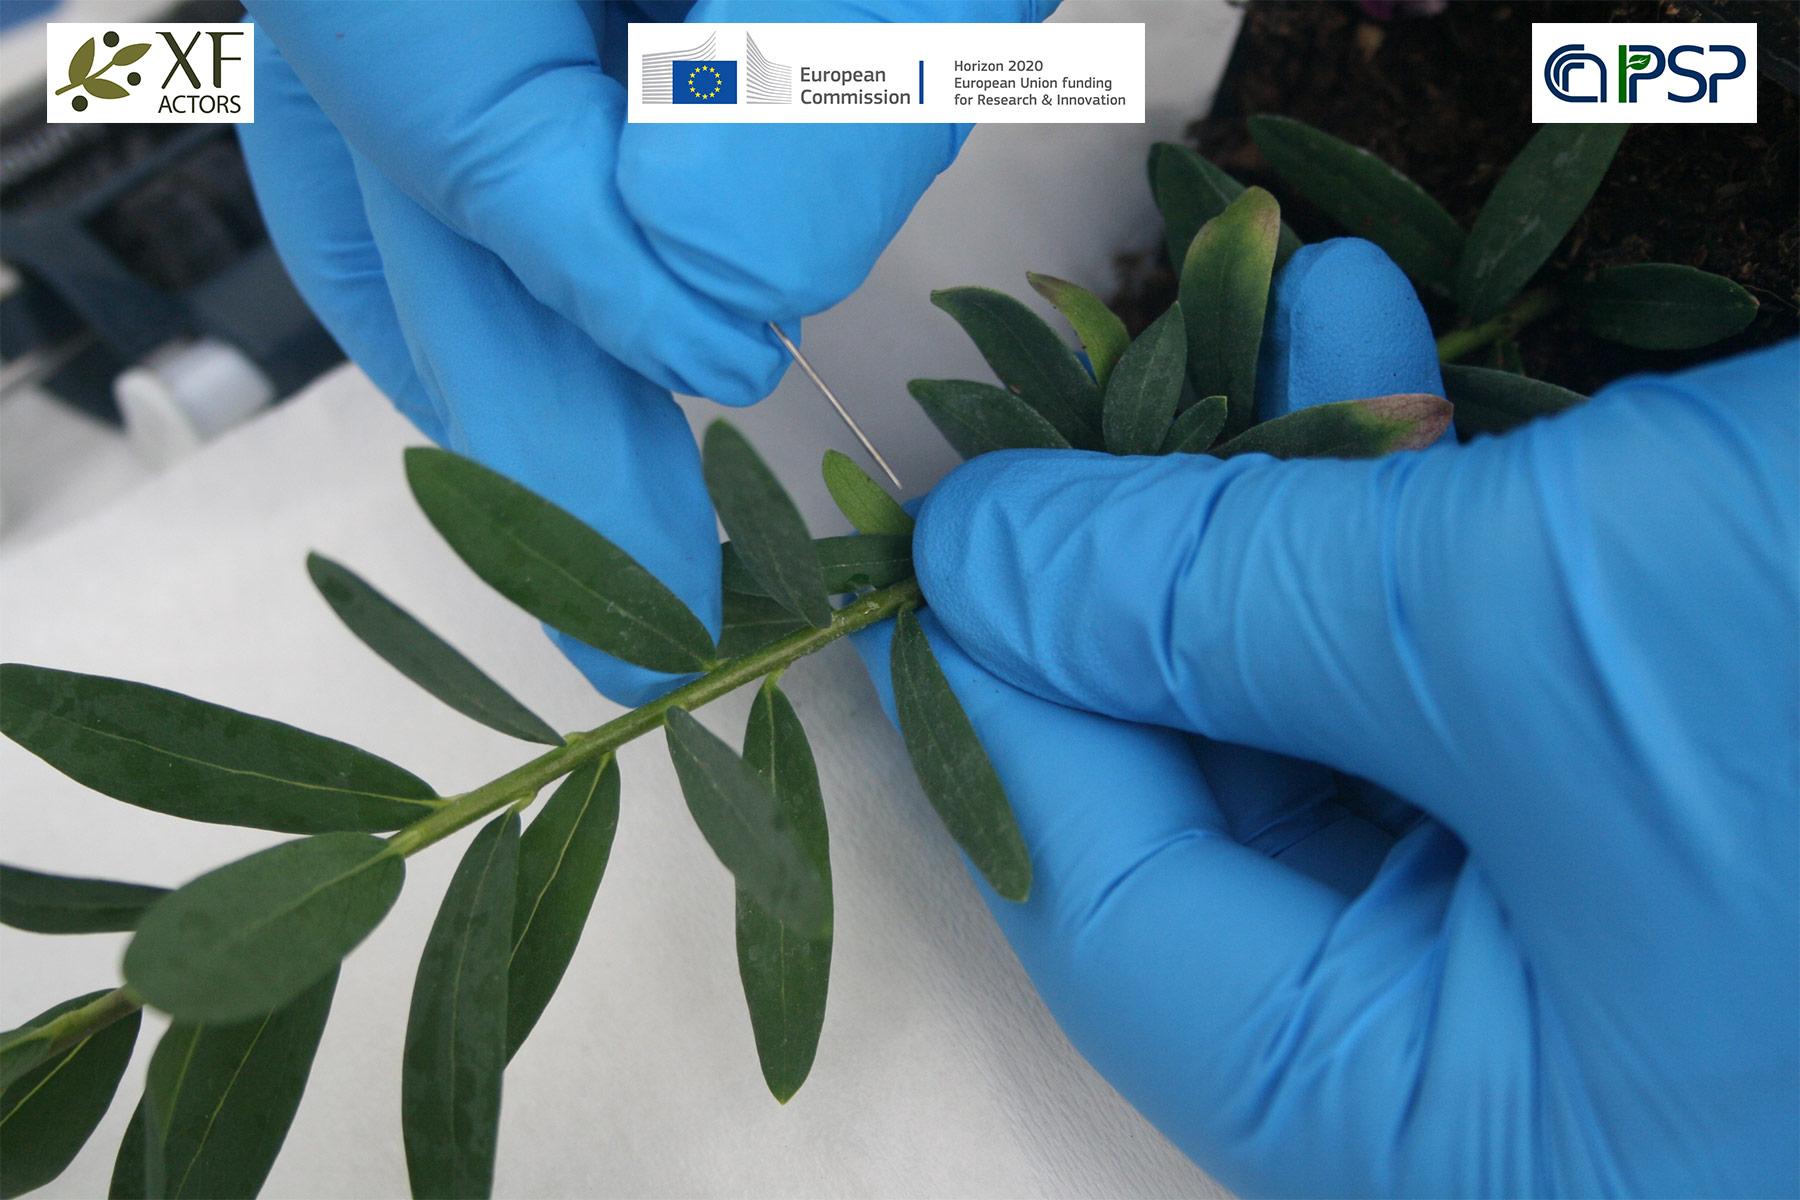 07 - inoculation Xf in Polygala myrtifolia